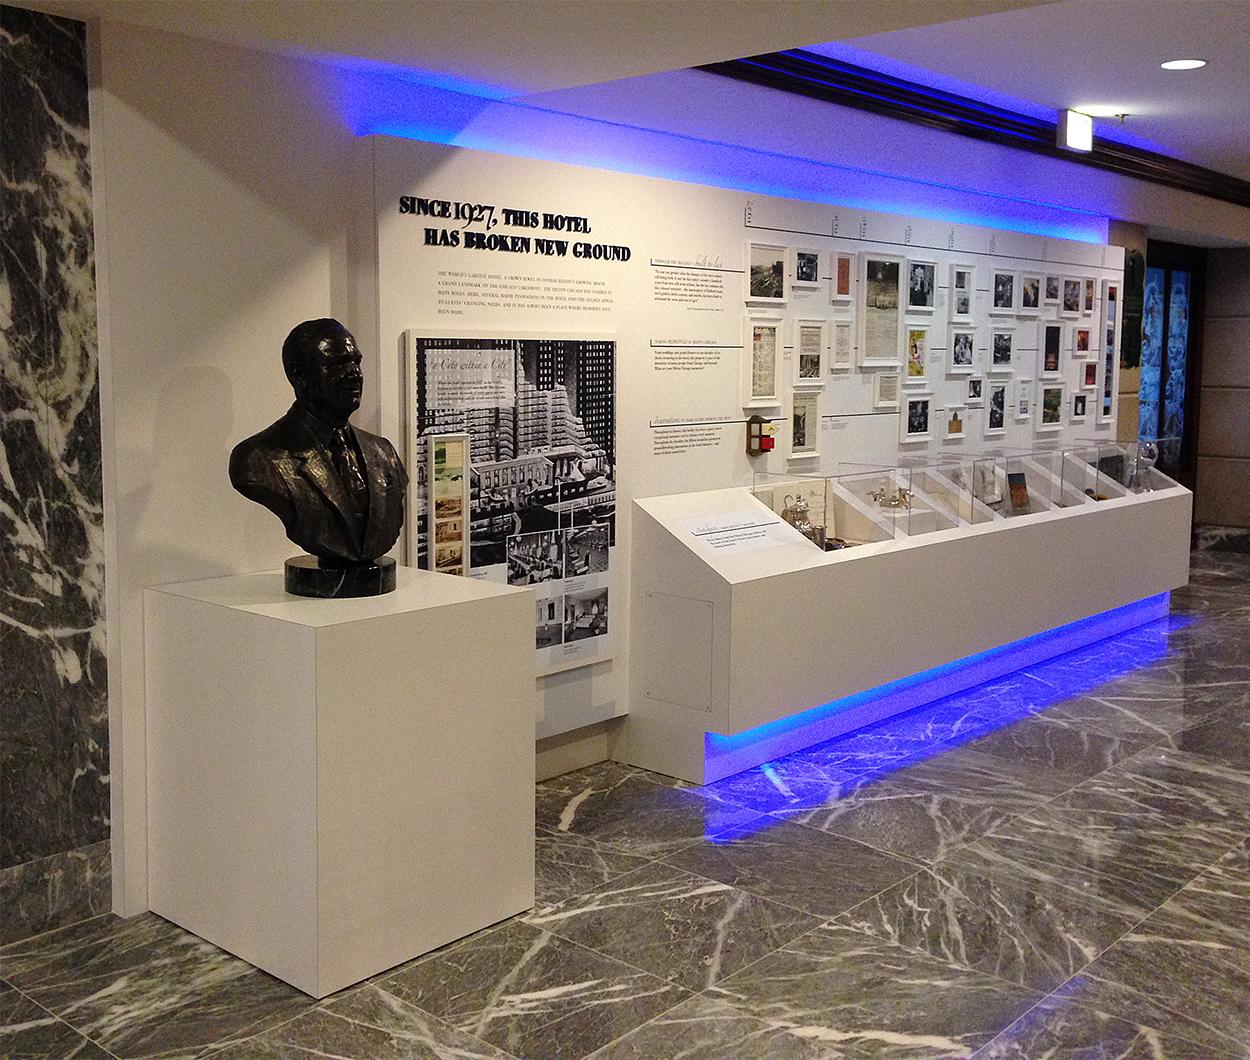 Hilton Historical Exhibit